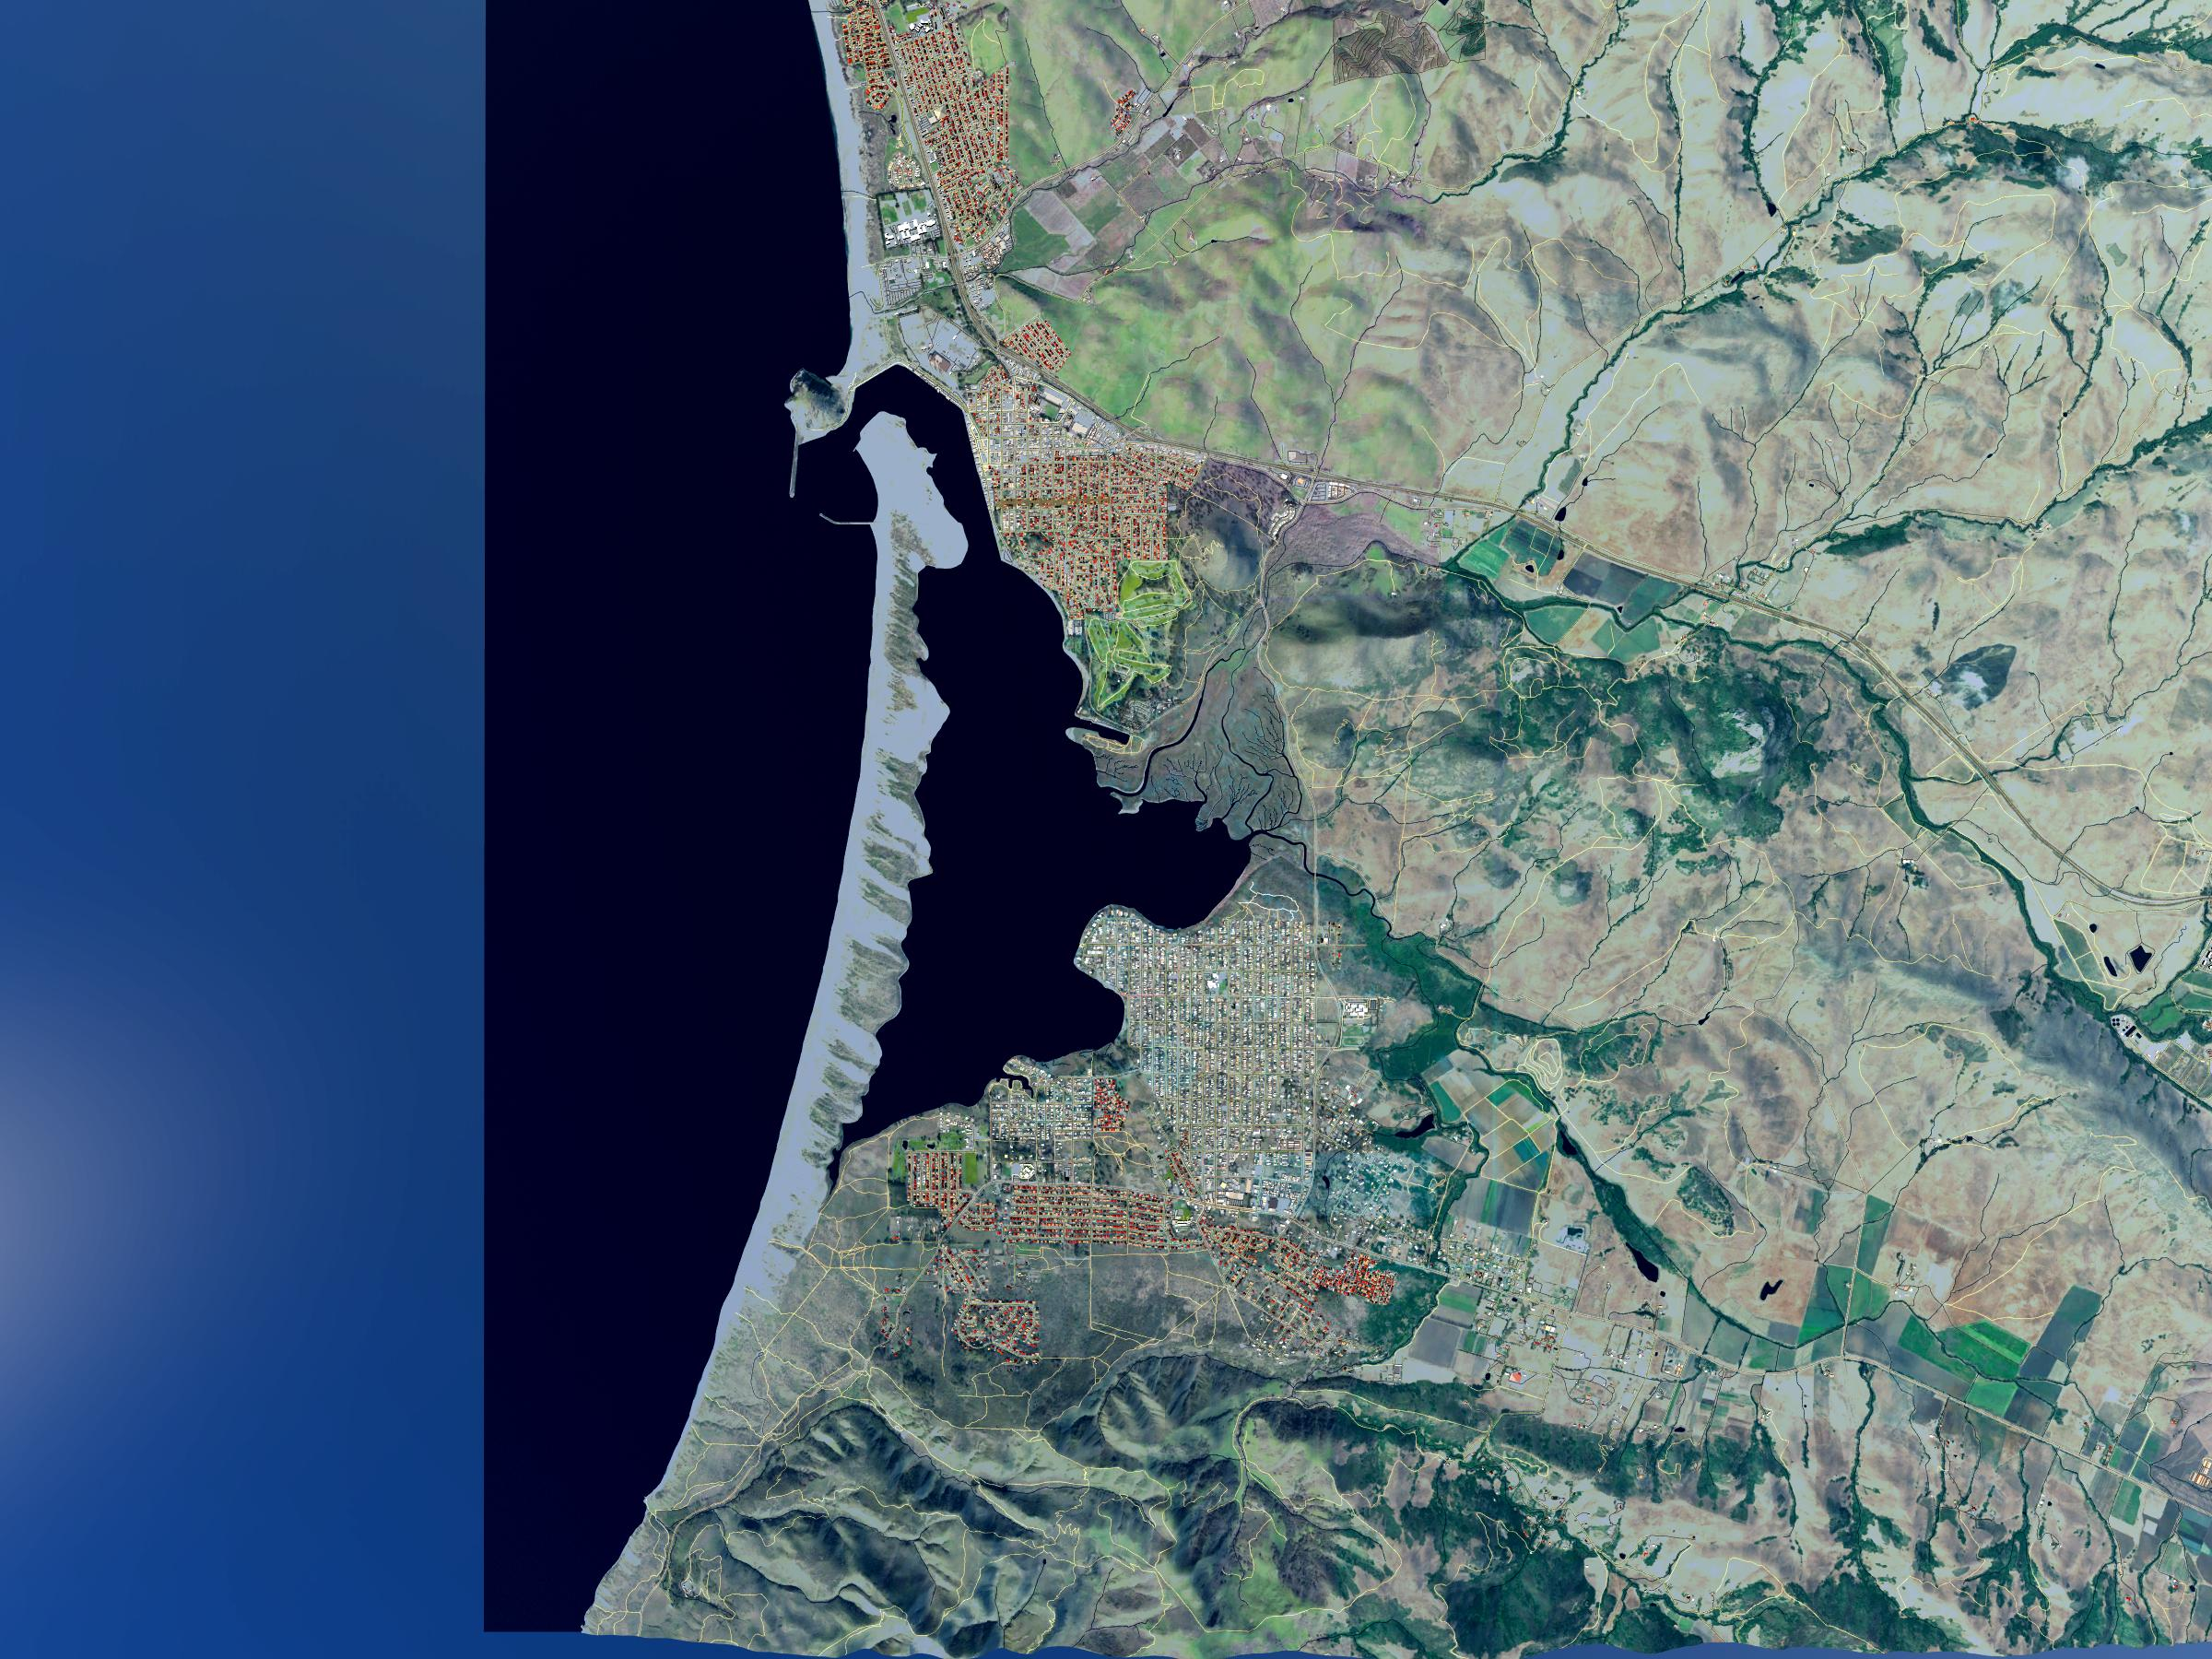 2.Morro Bay 2D Snapshot.jpg